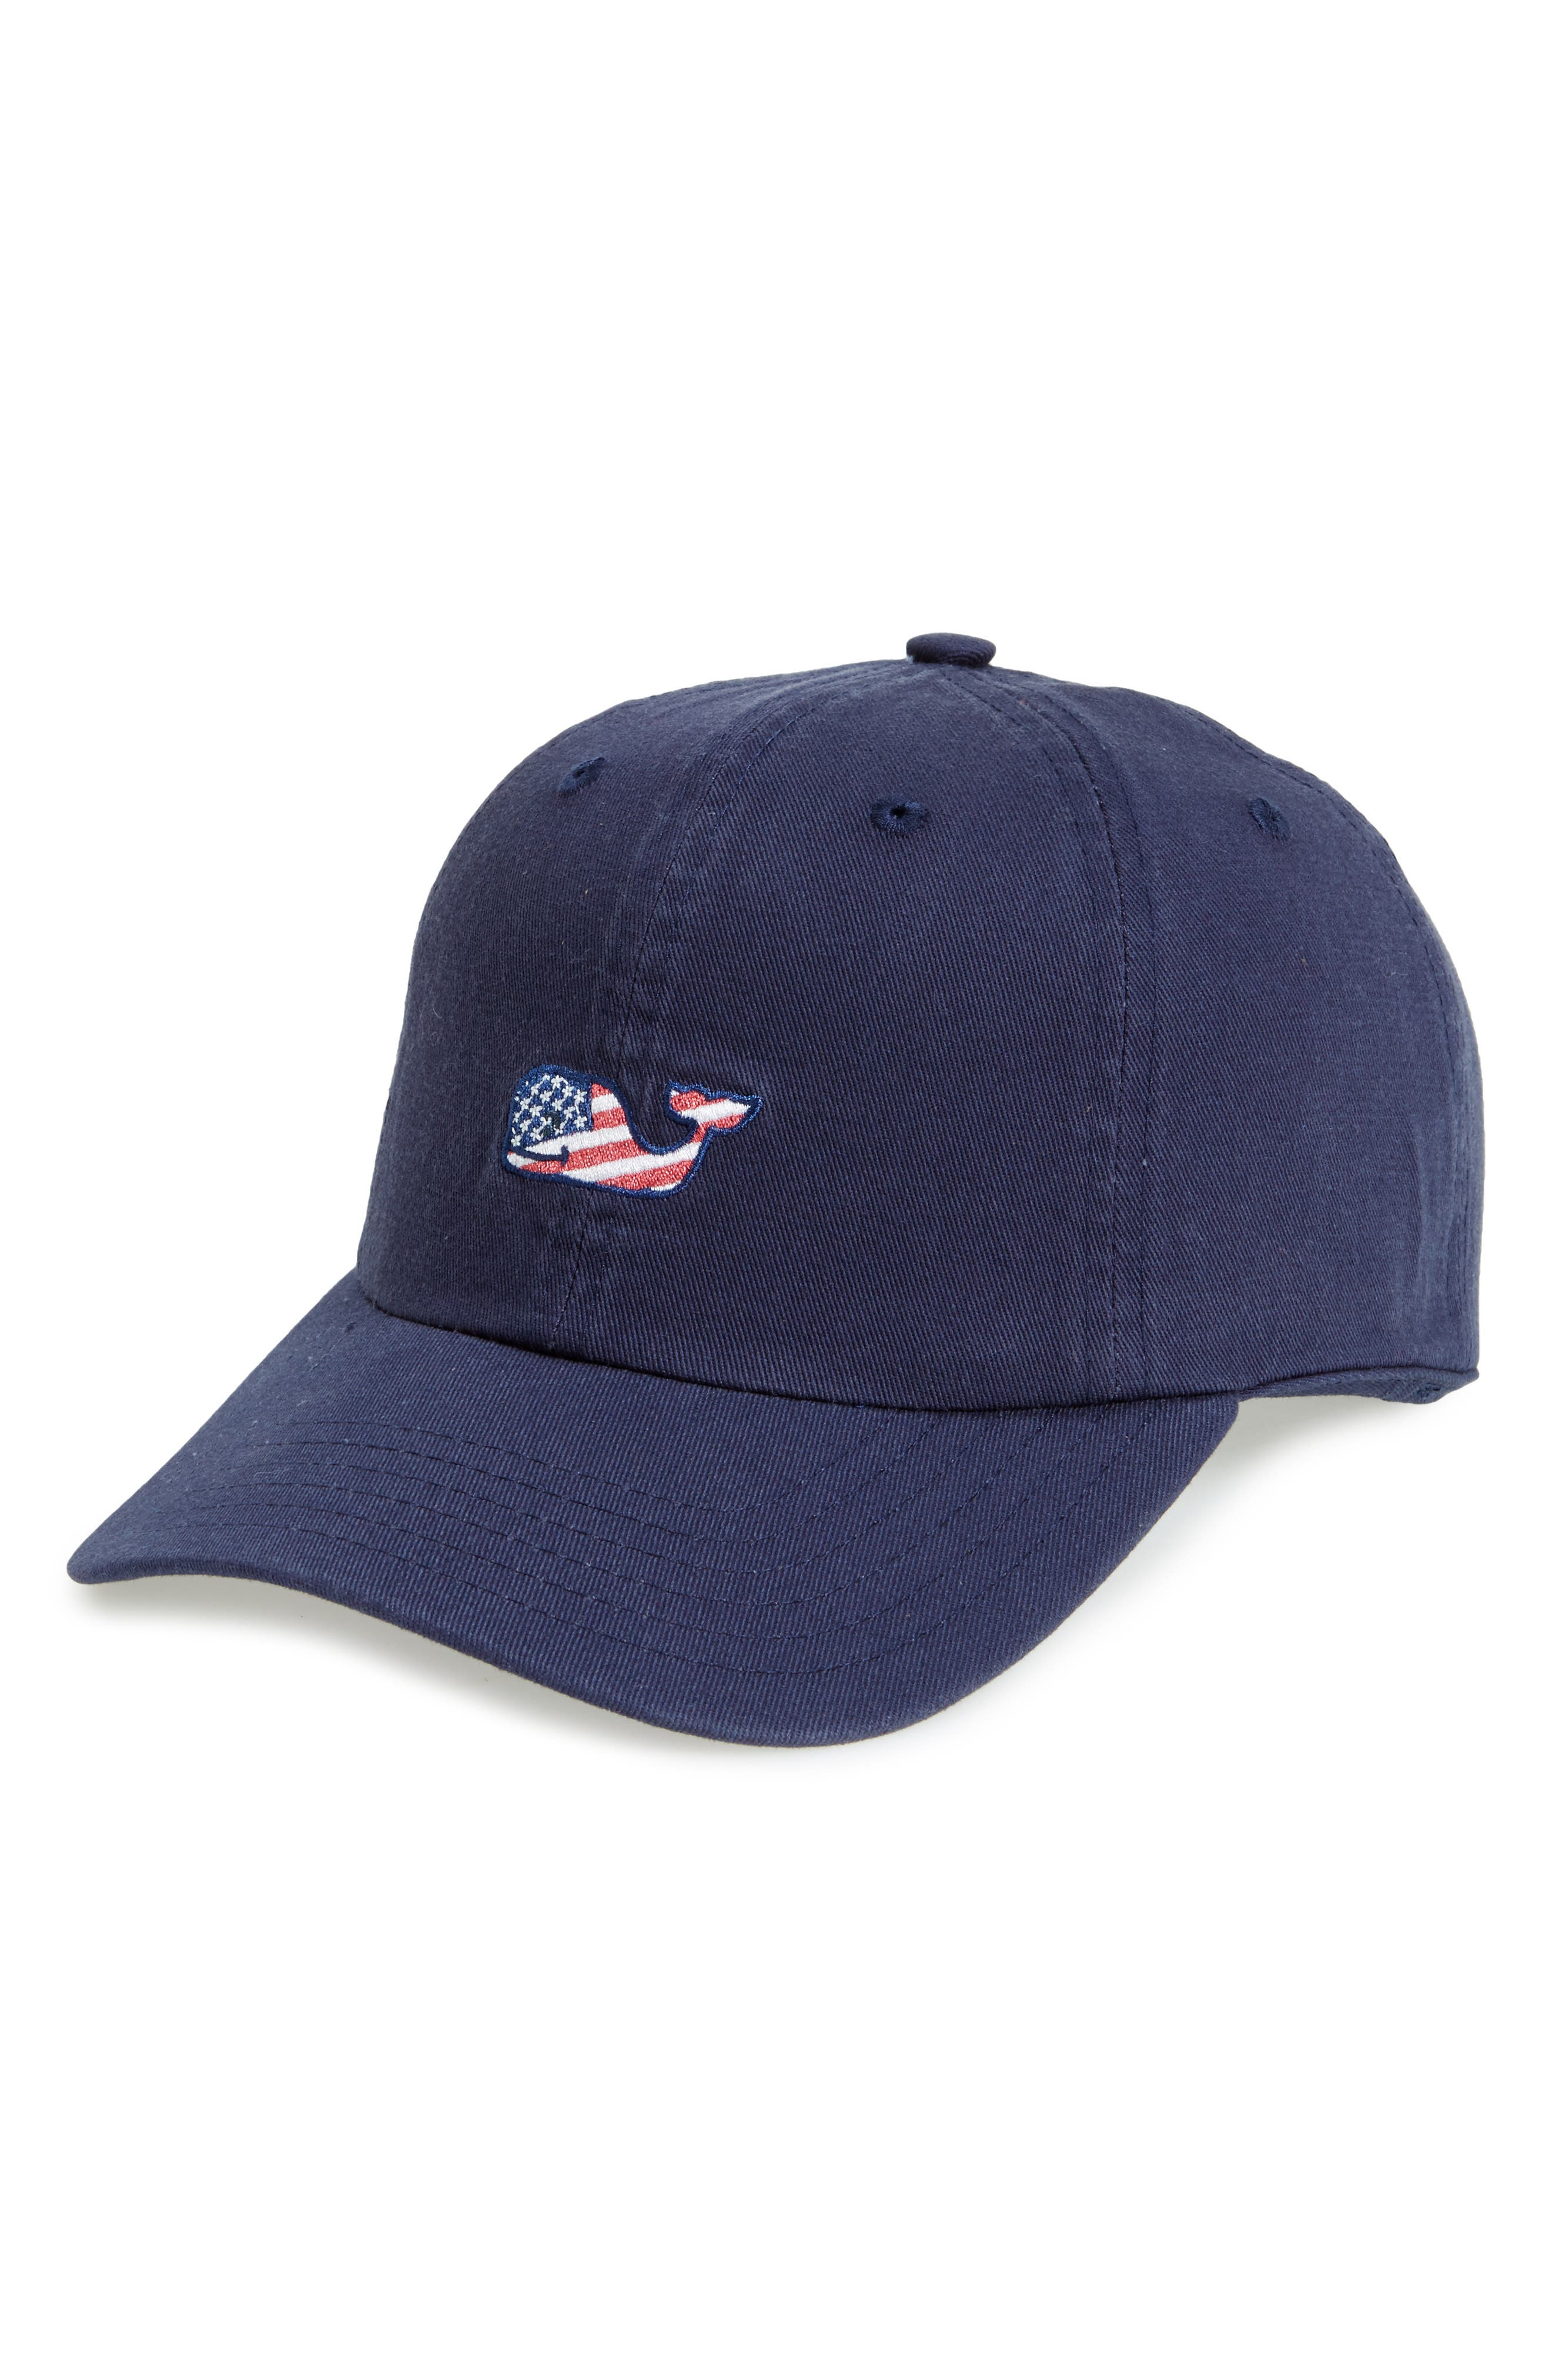 Vineyard Vines 'Flag Whale Logo' Baseball Cap